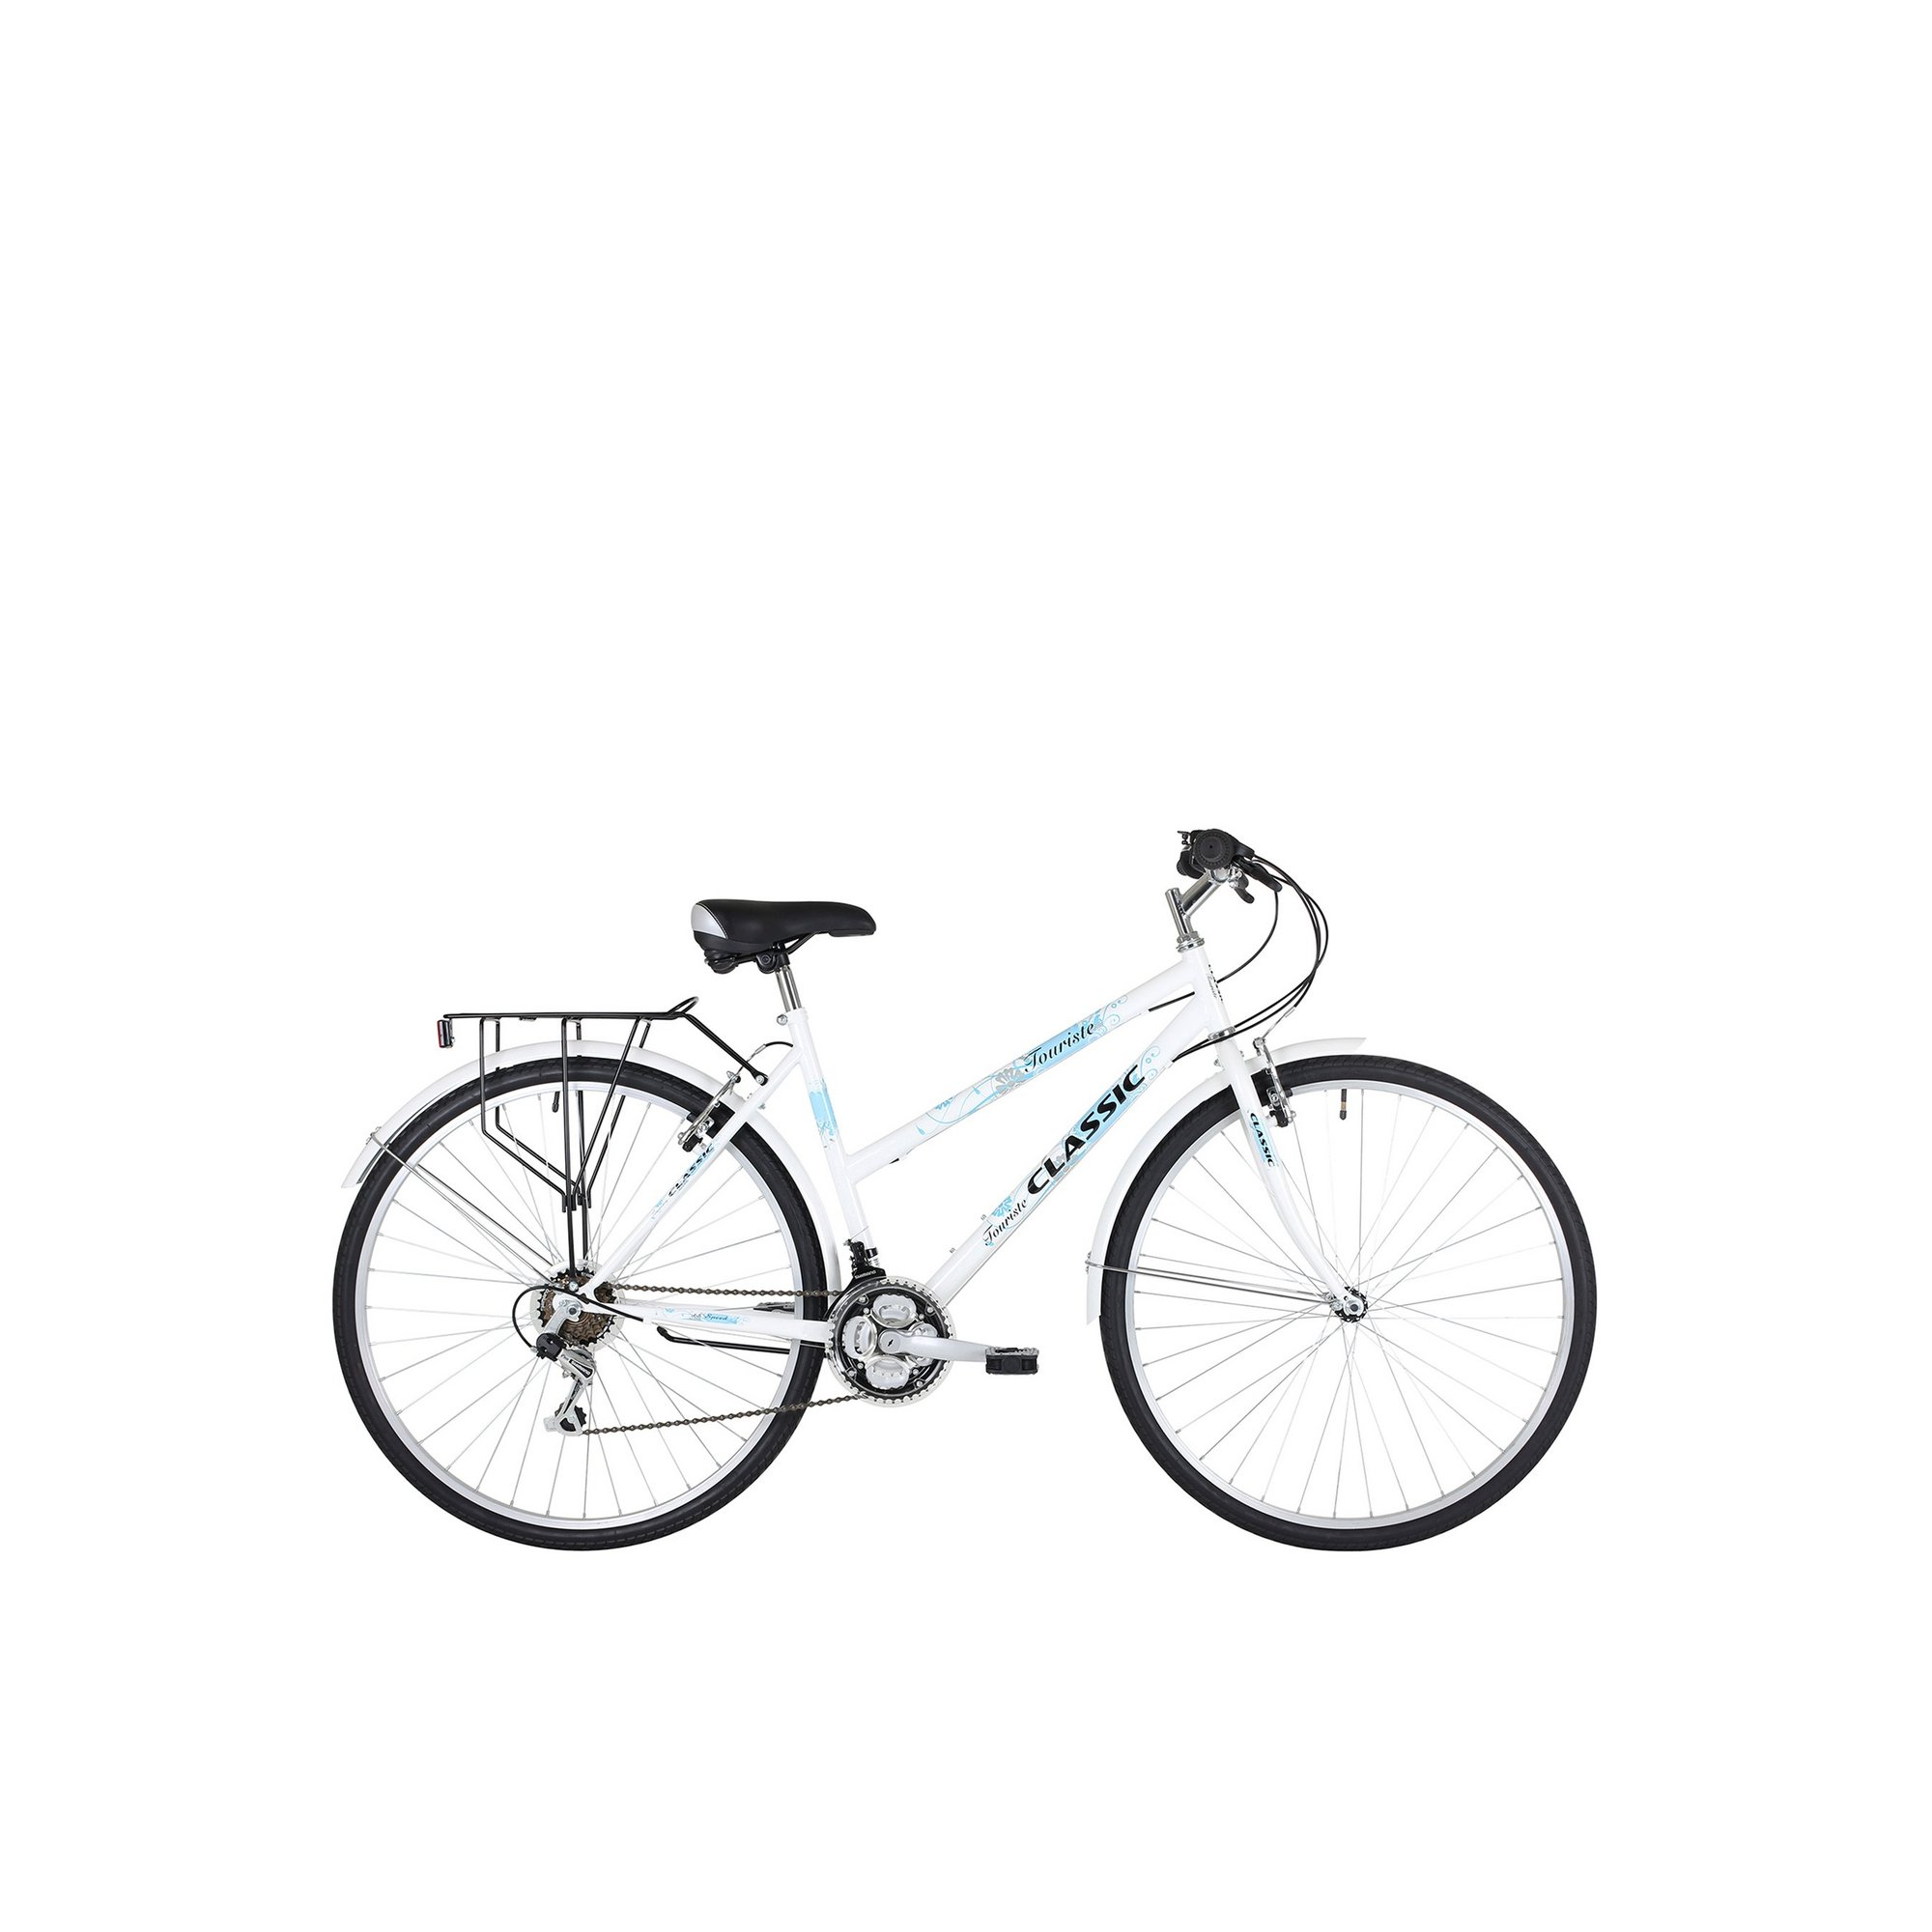 Image of Classic Touriste Womens Urban Bike - 19 Inch